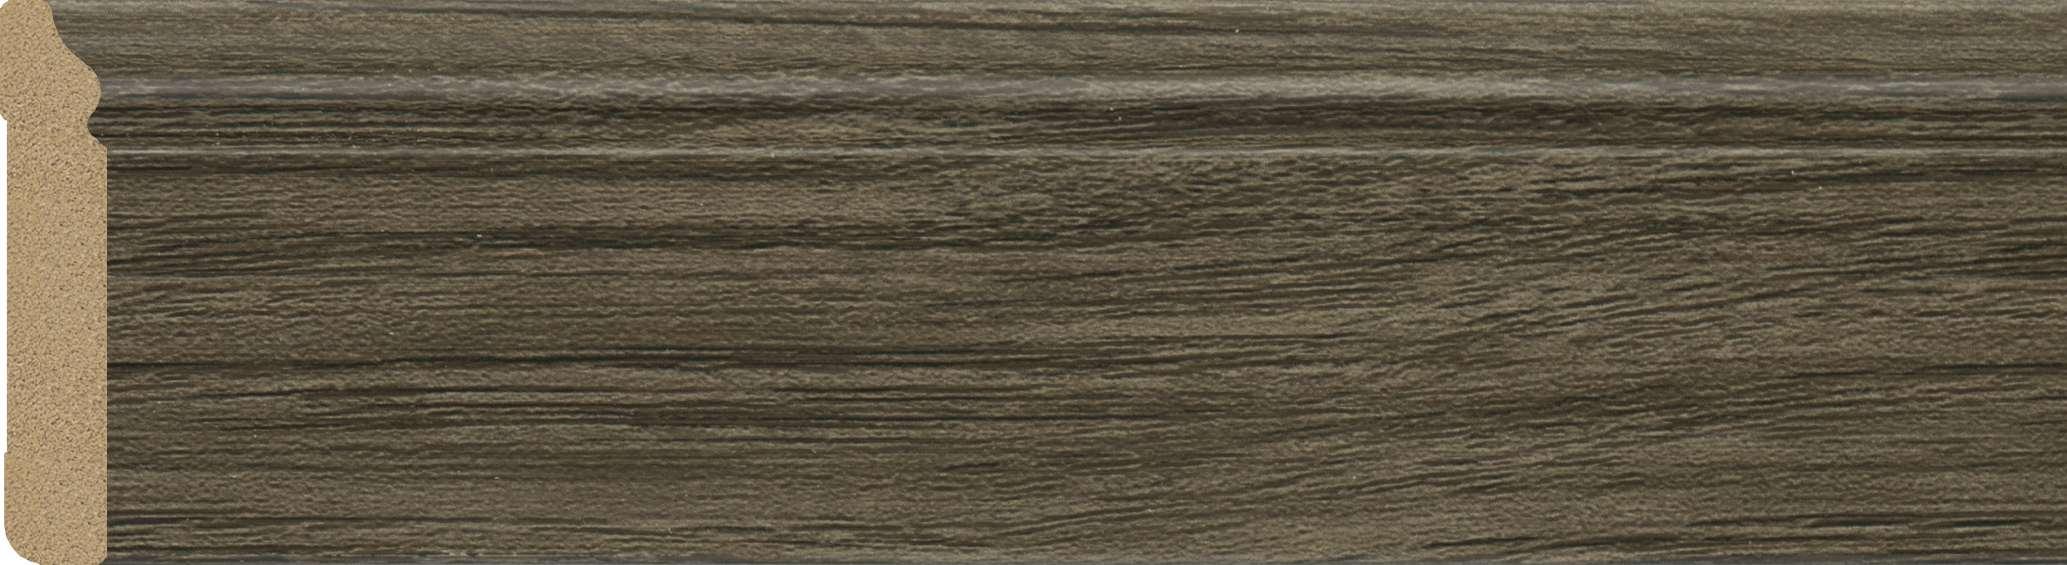 grey oak plastic skirting board